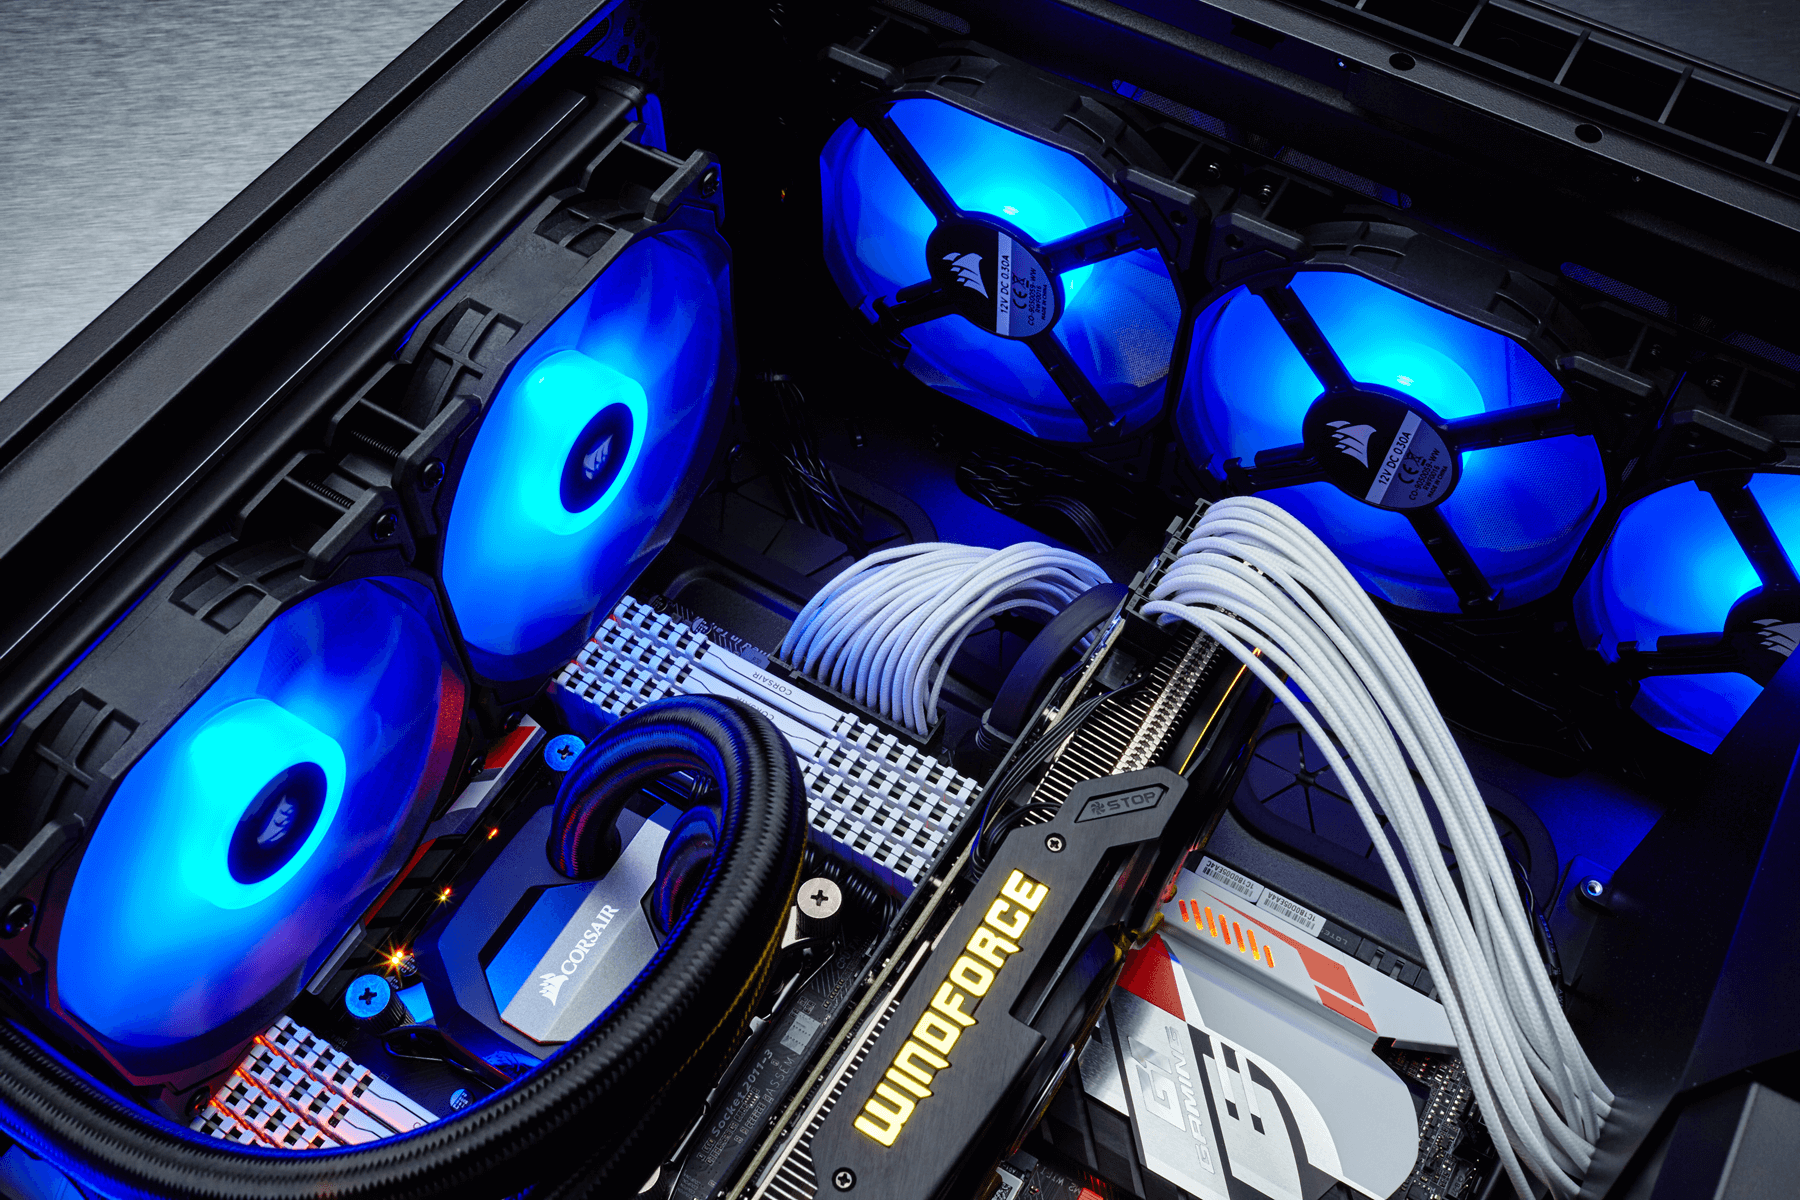 Corsair sp120 computer case ventilatore ventola nero bianco